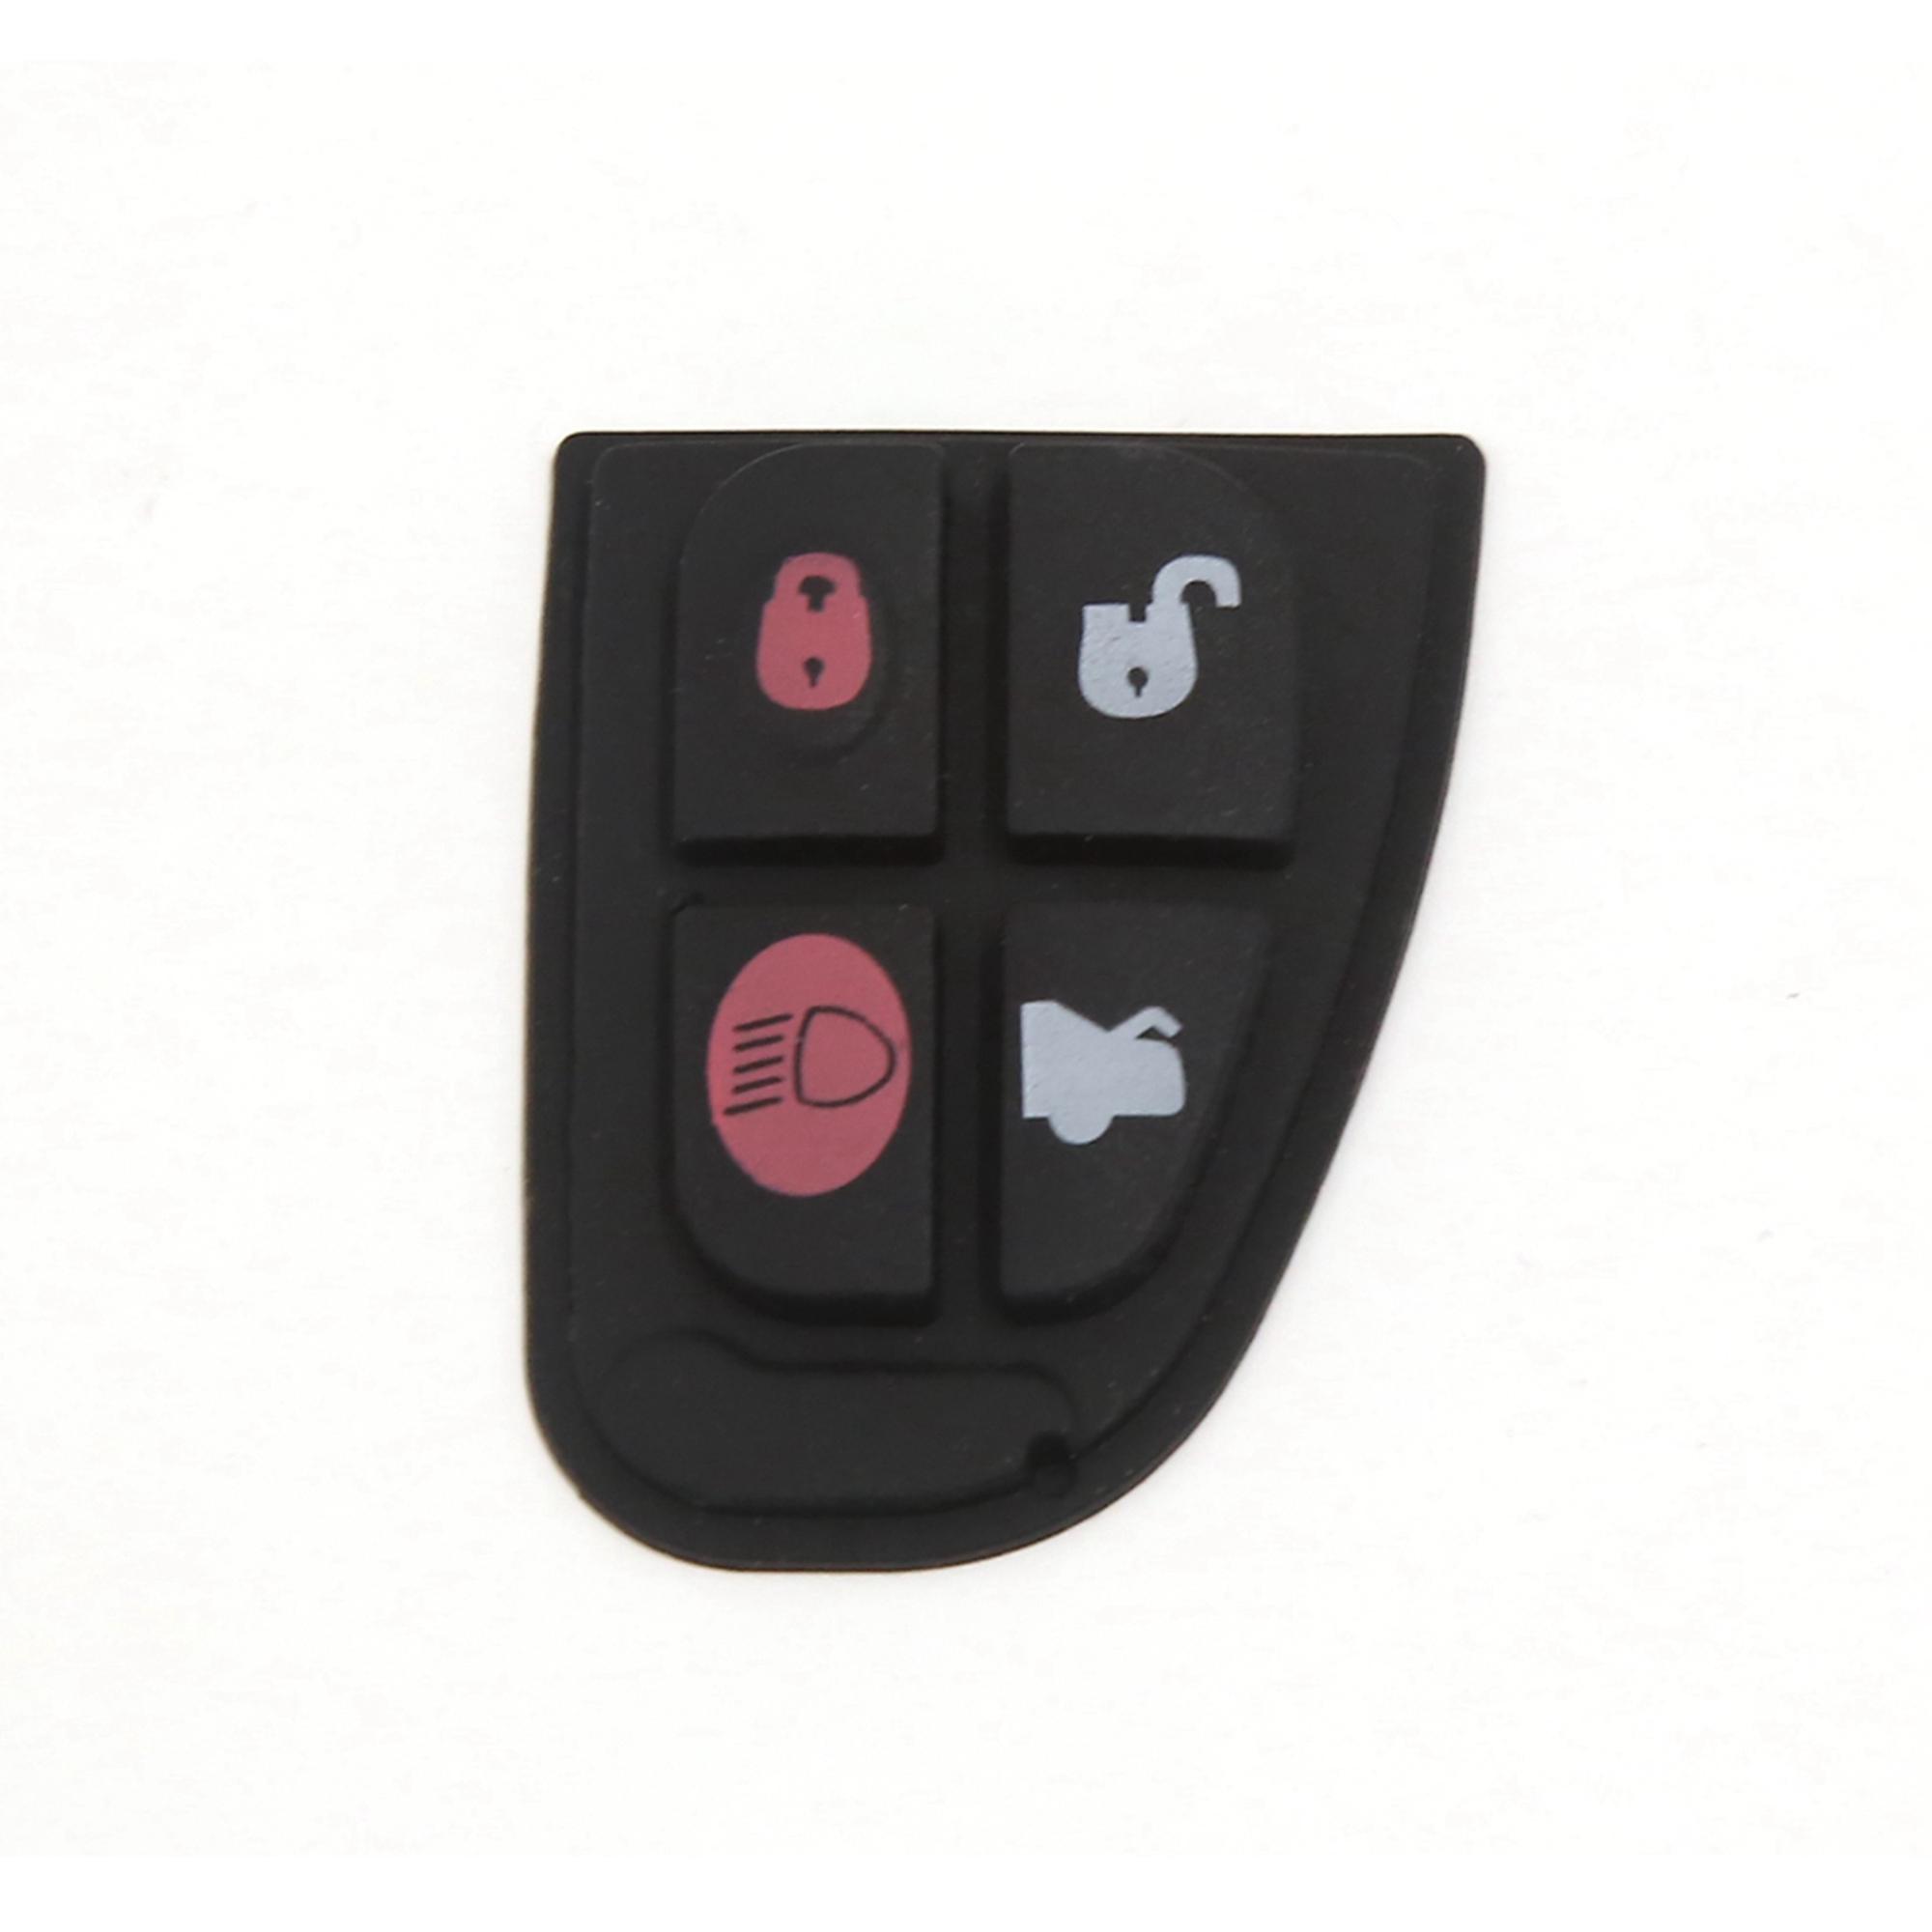 Keyless Remote Key Fob 4 Button Rubber Pad Fits for Jaguar X S XJ XK Type